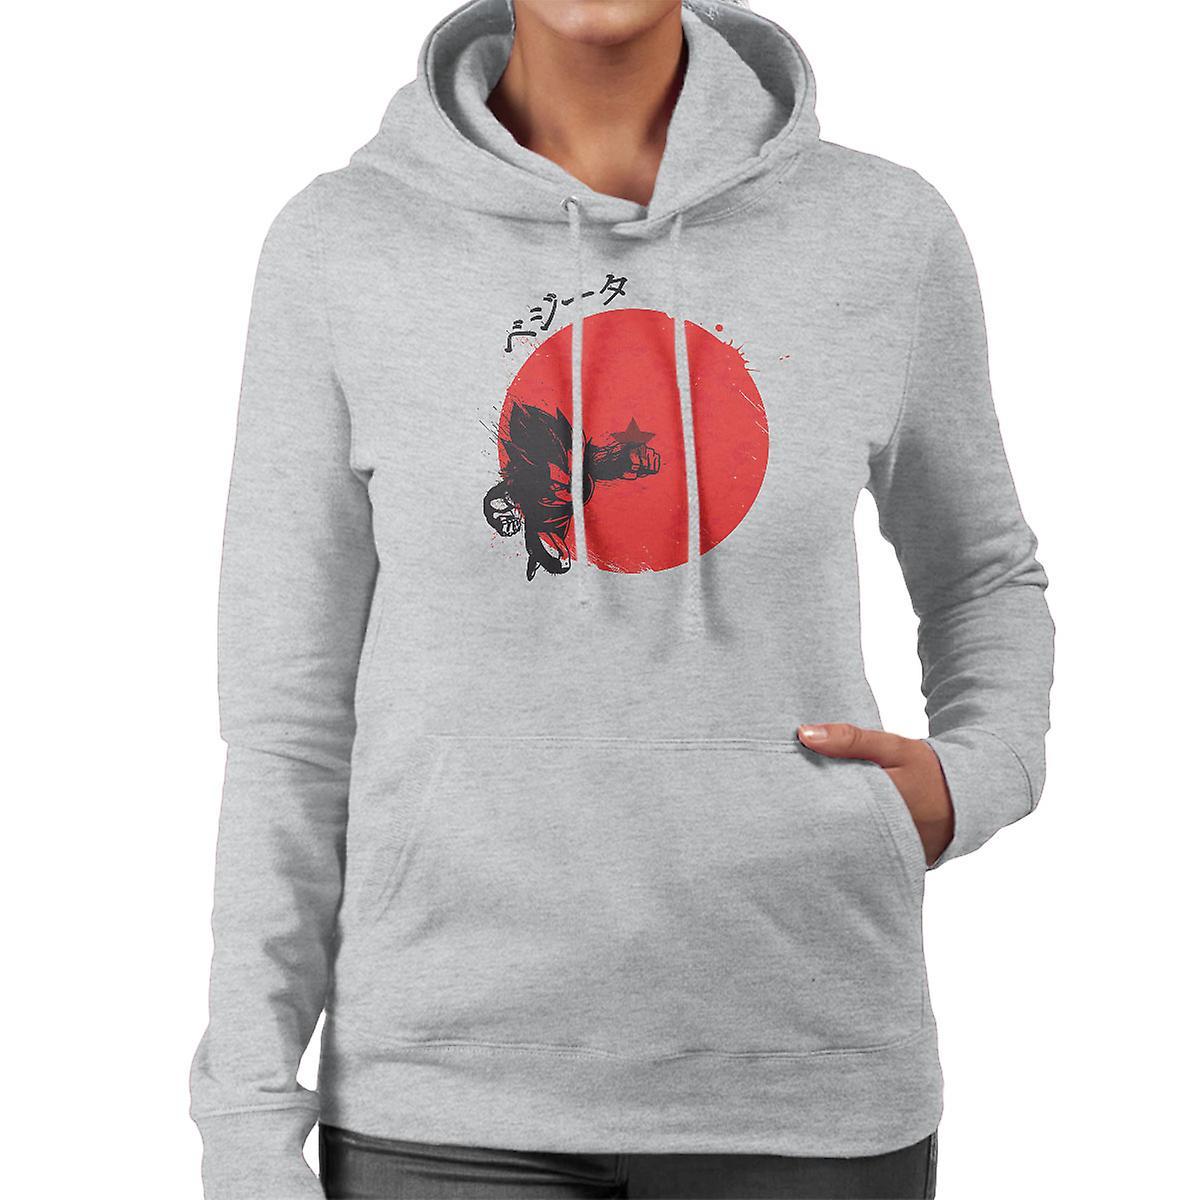 Rote Sonne Vegeta Dragonball Z Damen Sweatshirt mit Kapuze   Fruugo 751f68dece